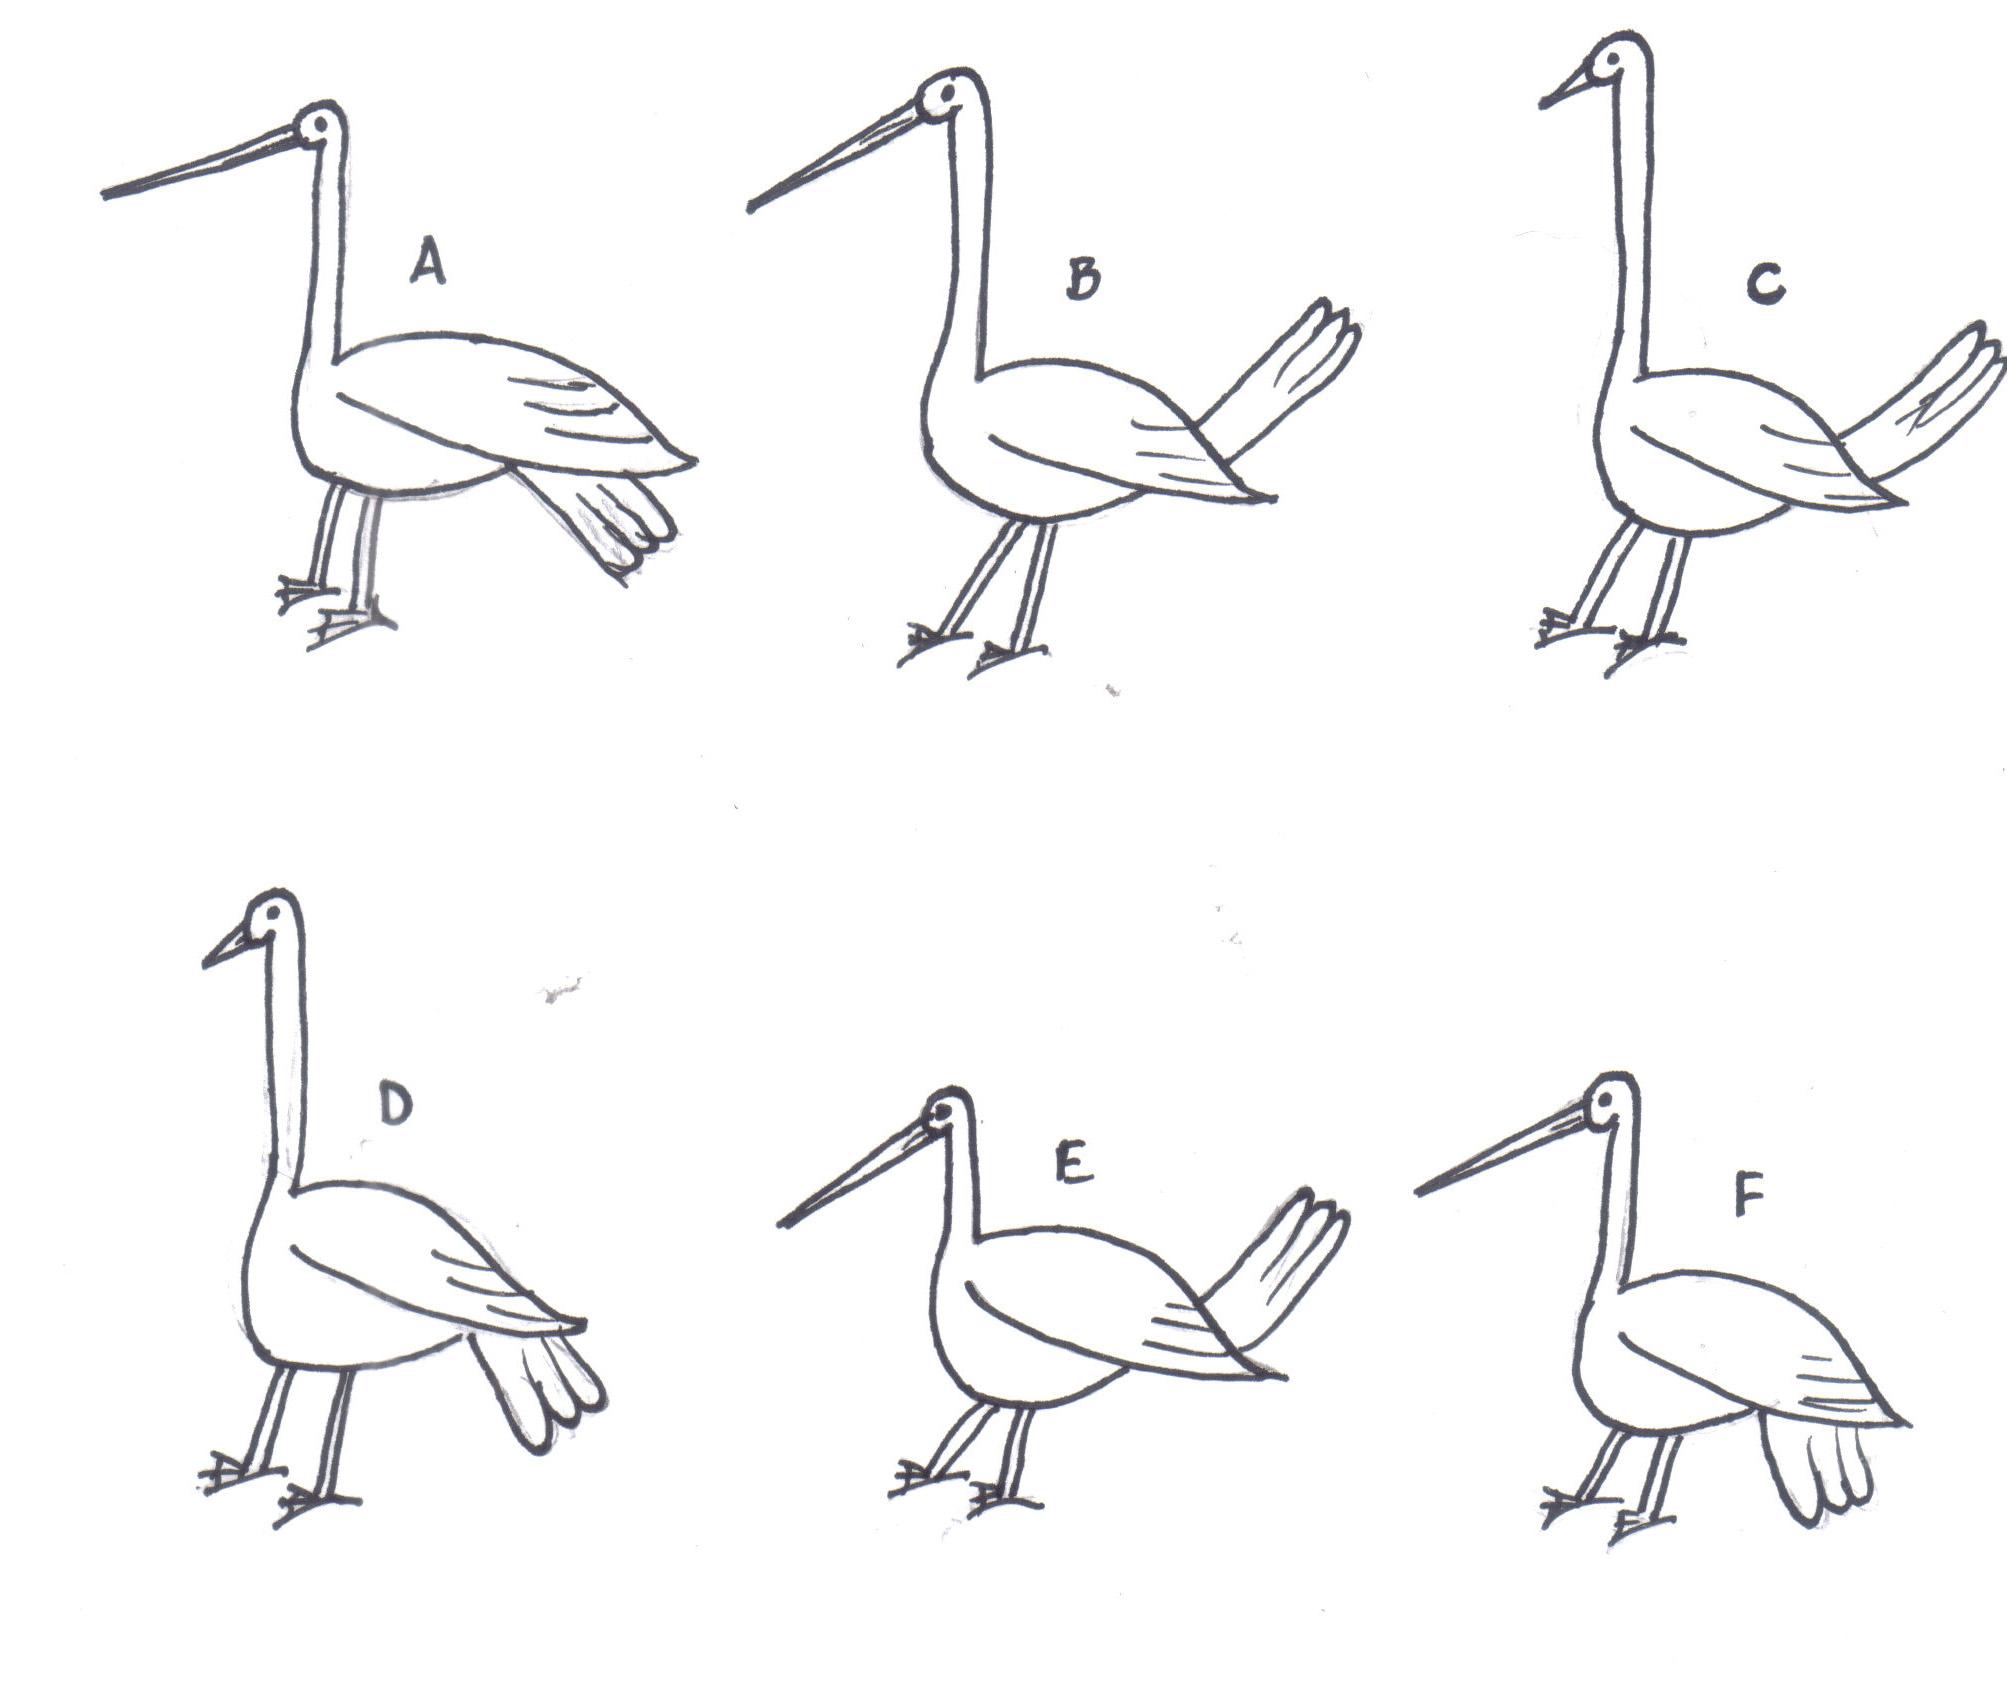 Goose key